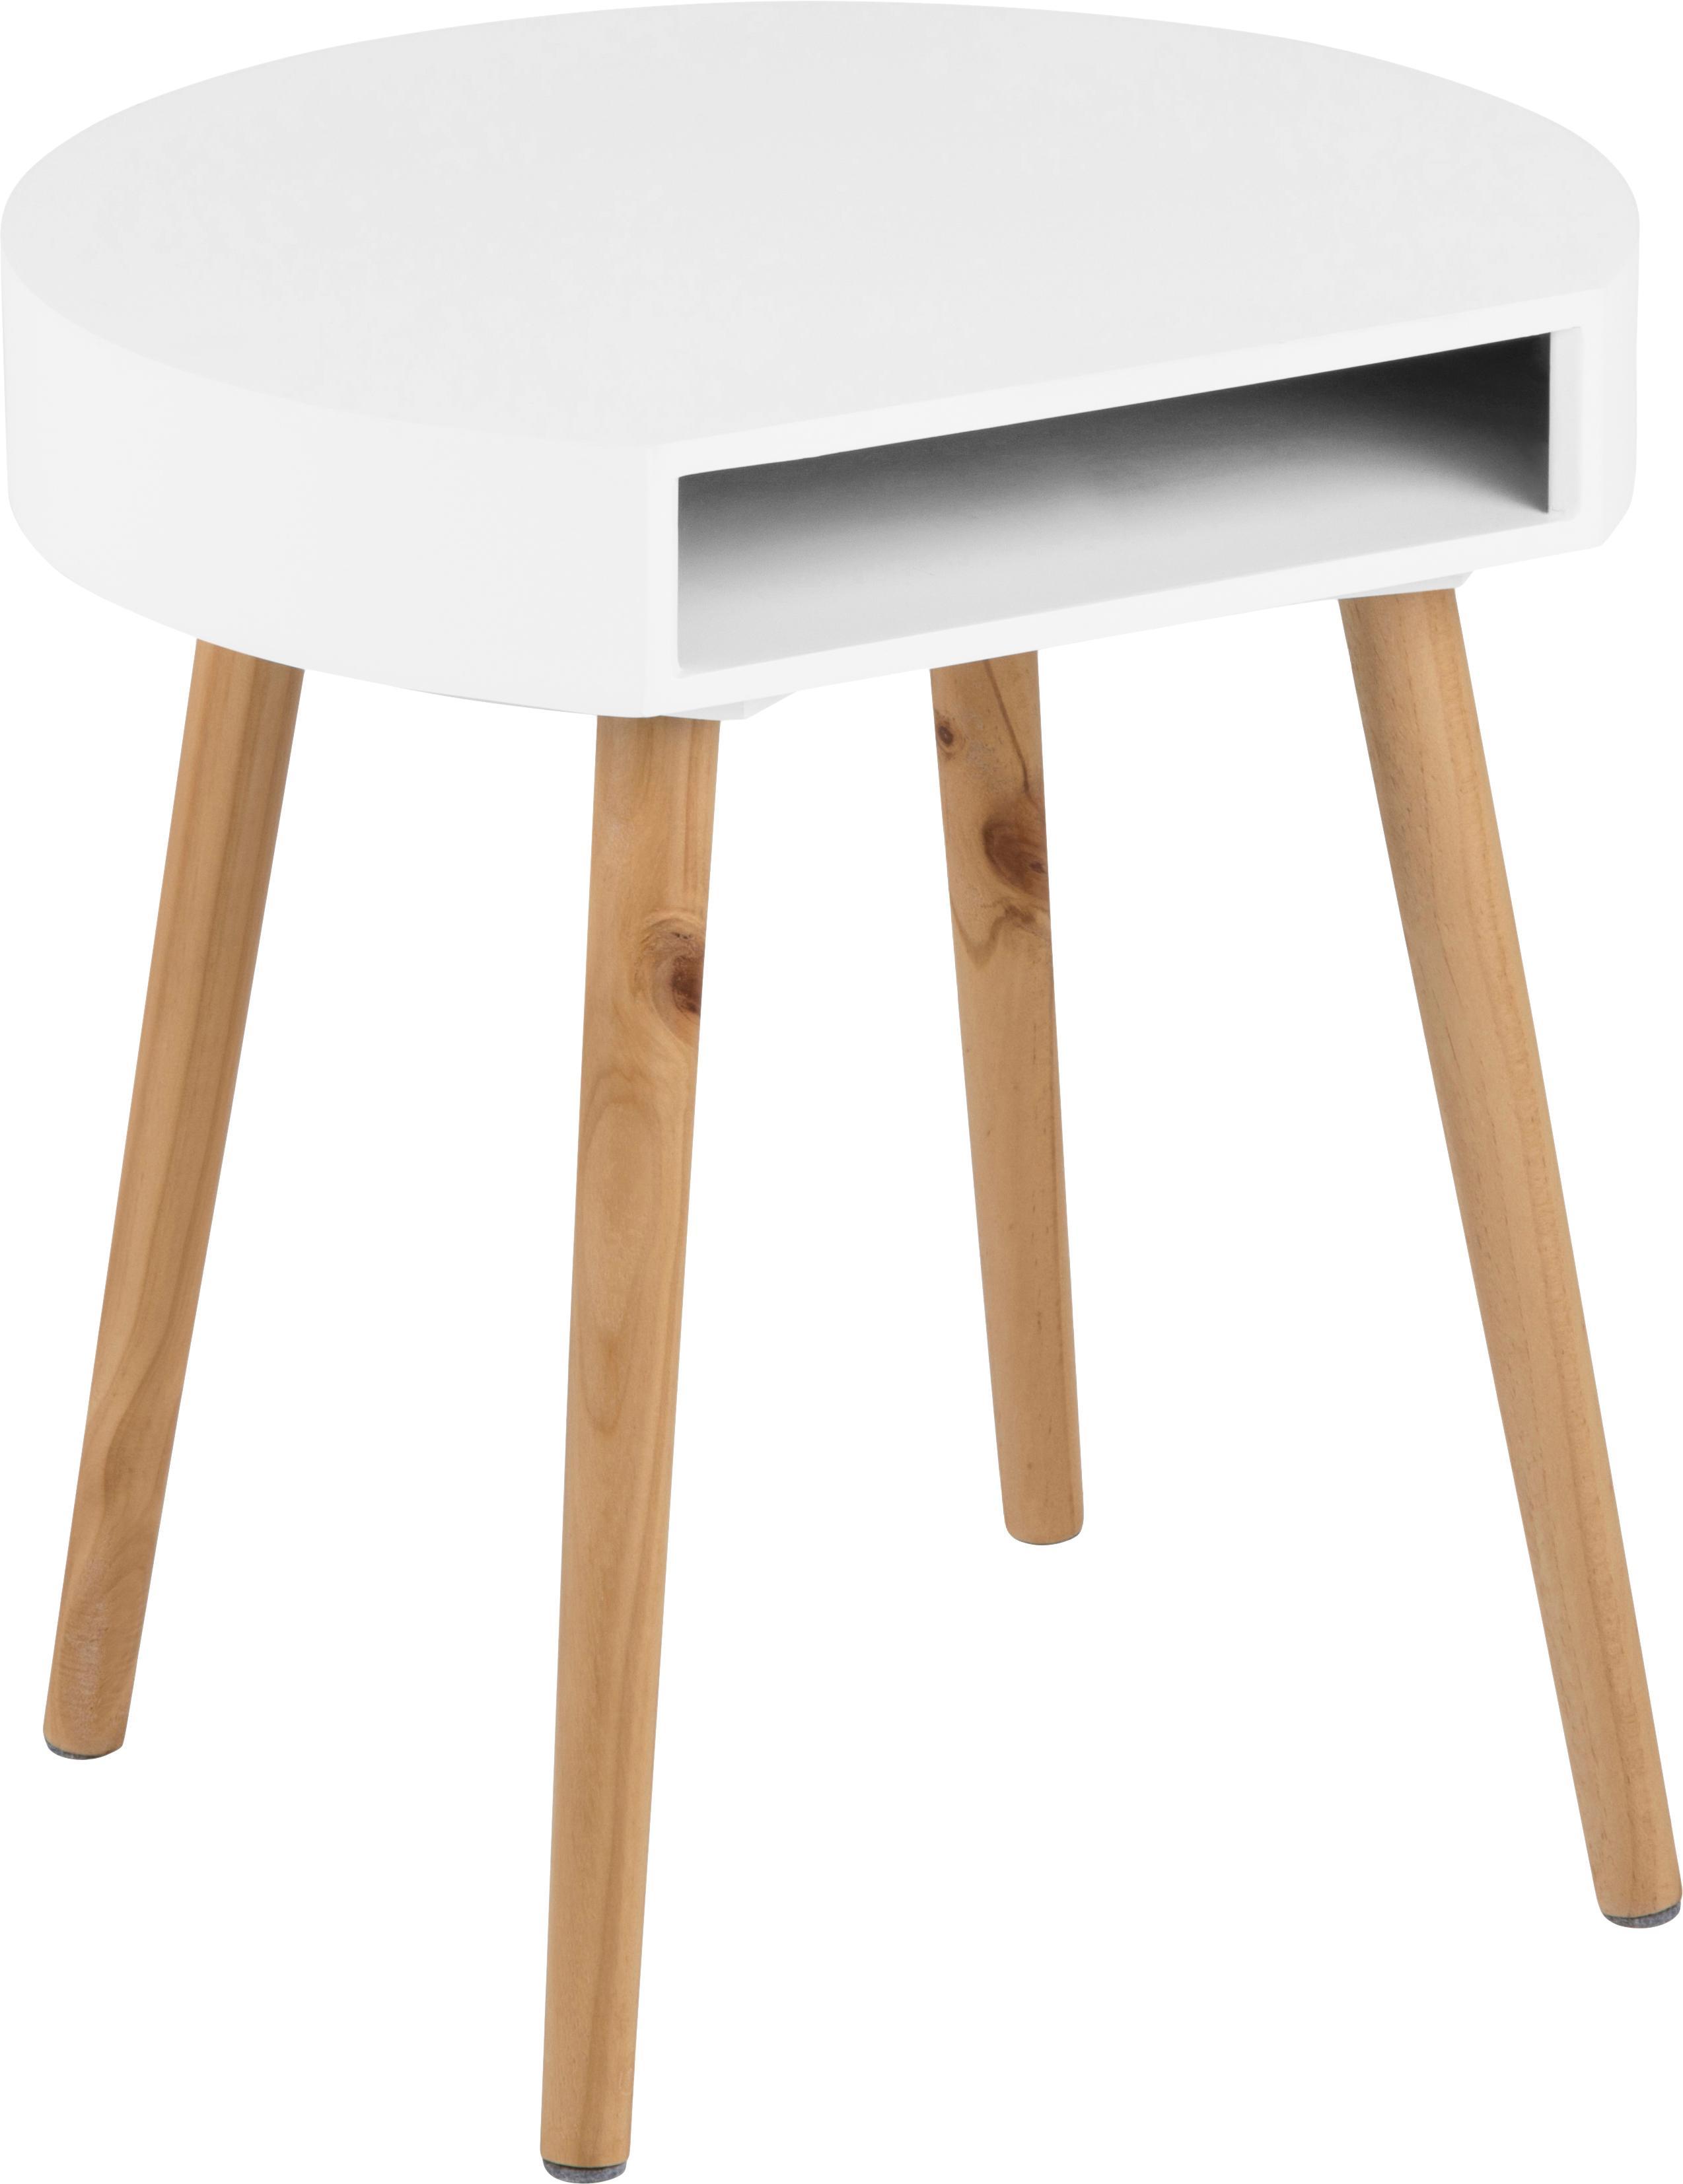 Bijzettafel Ela met opbergruimte, Gelakt hout, Wit, houtkleurig, B 40 x D 36 cm